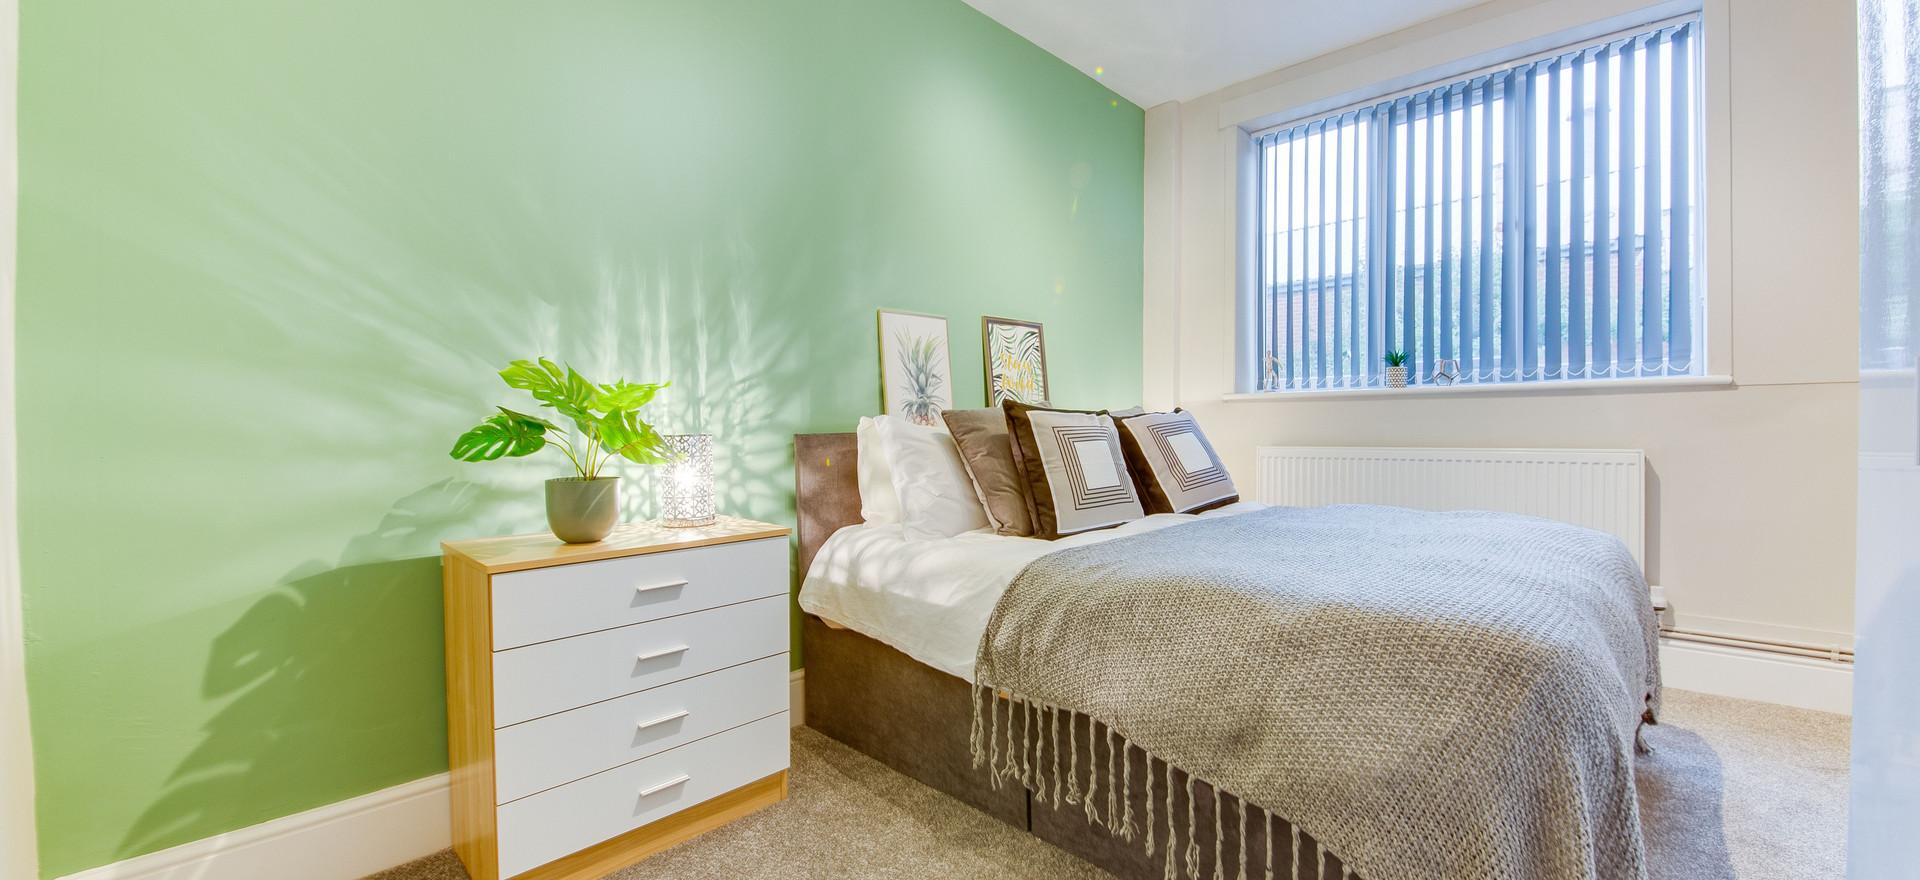 Bedroom 5.3.jpg